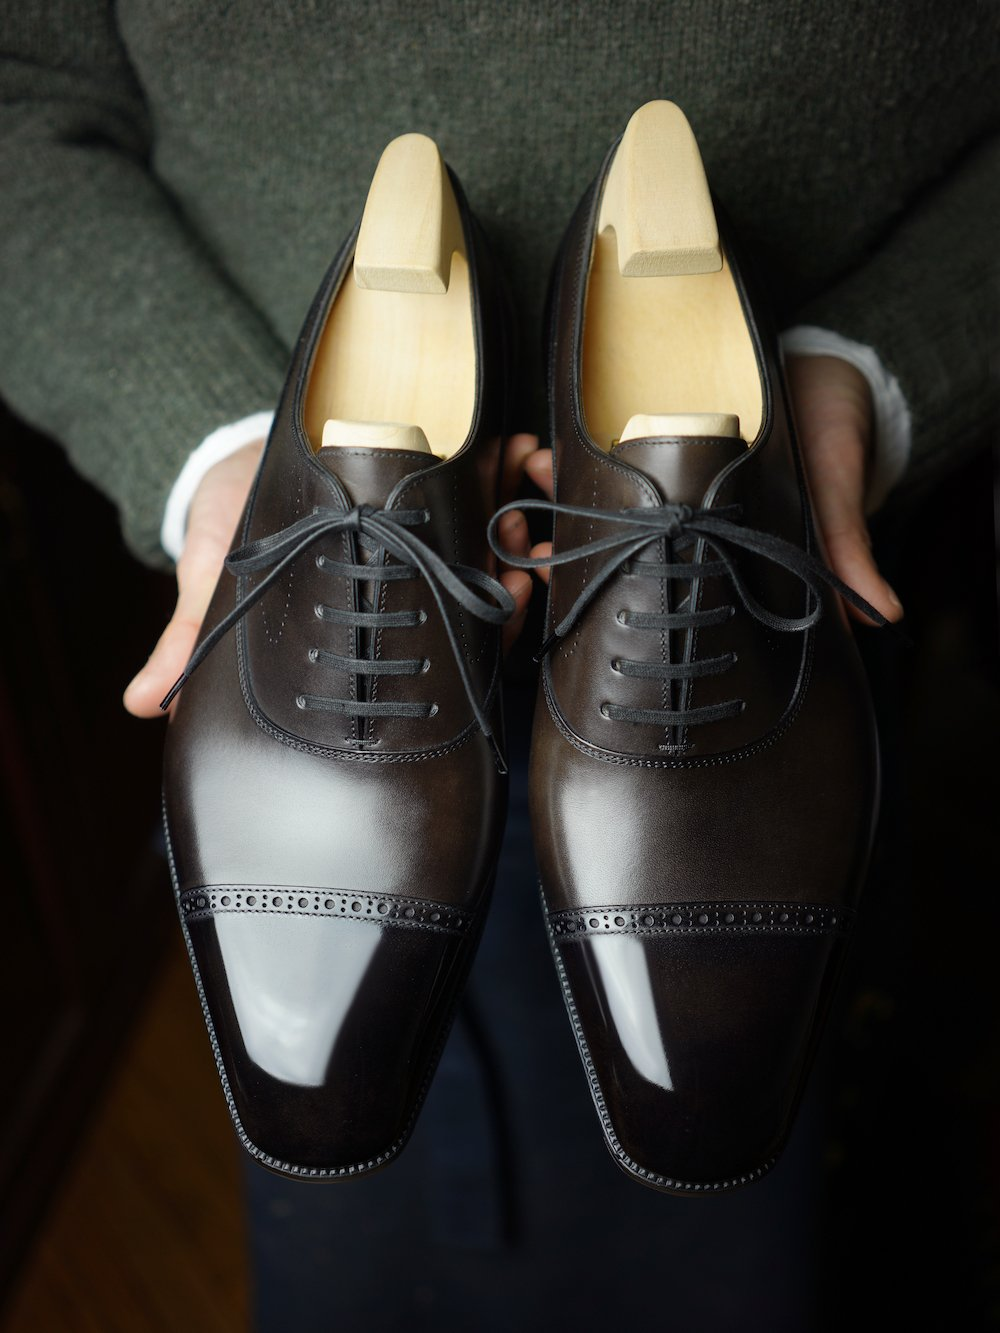 Yohei Fukuda bespoke shoes: Review